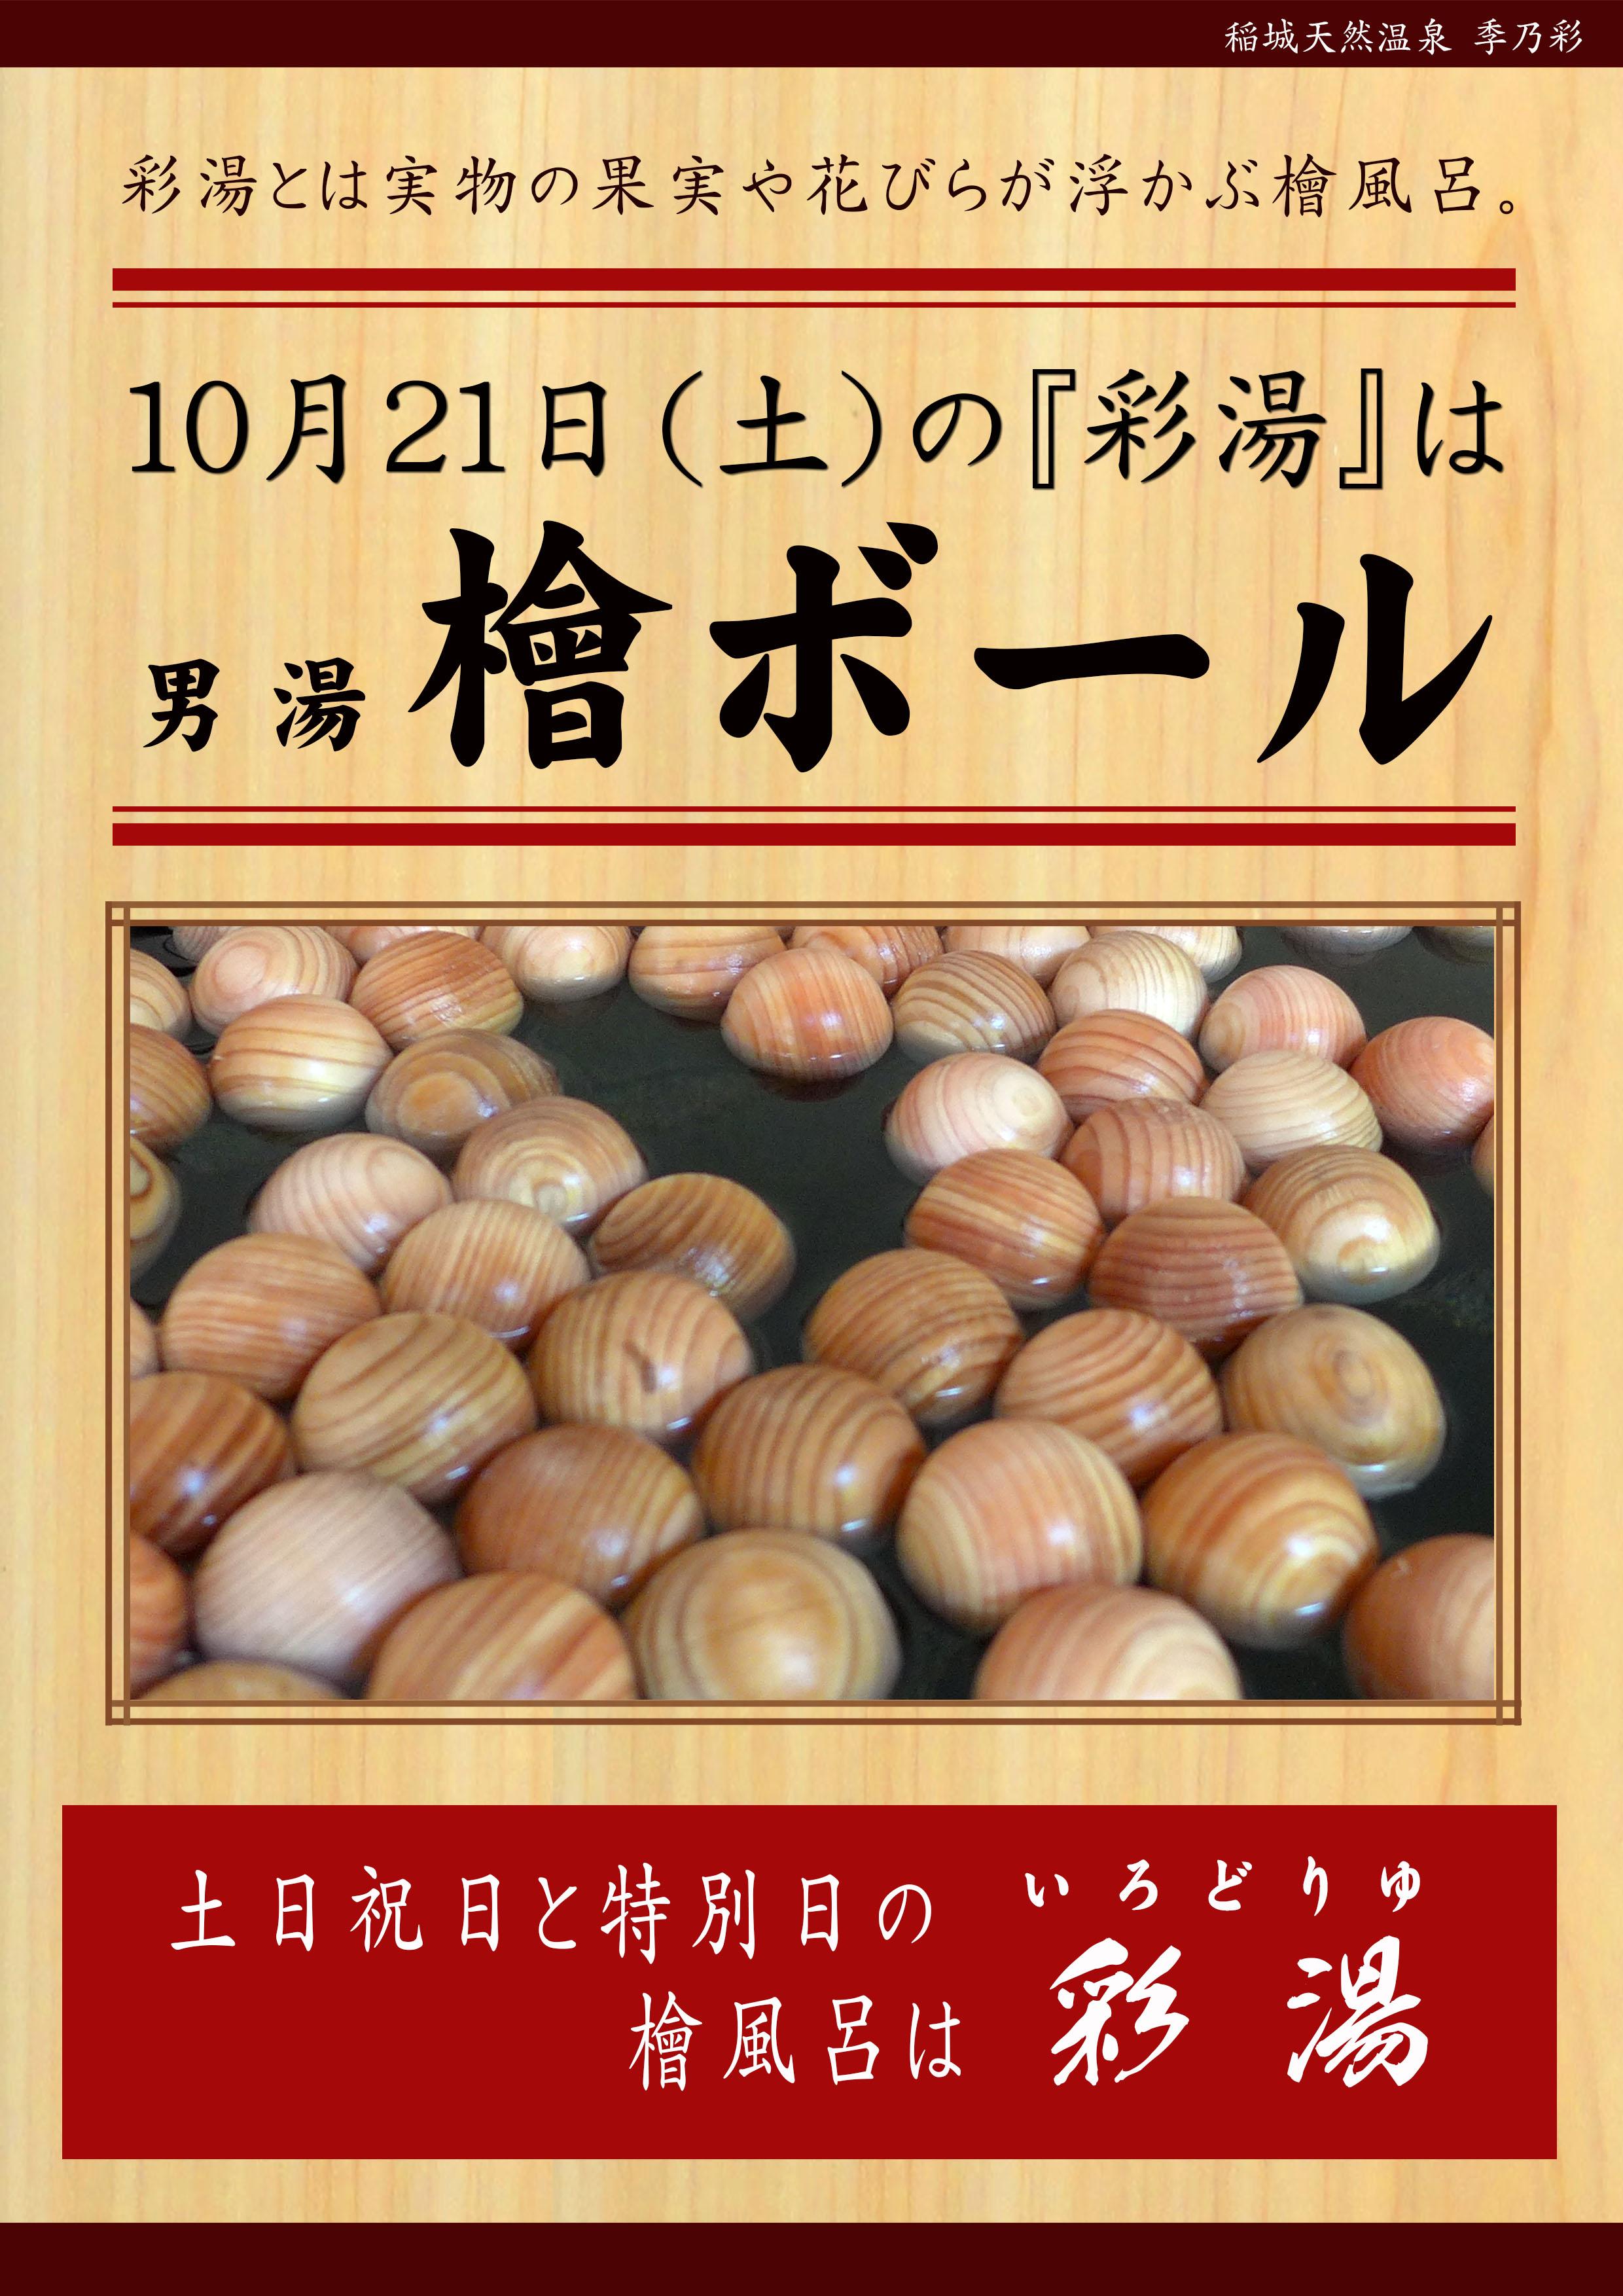 20171021POP イベント 彩湯 男湯 檜ボール